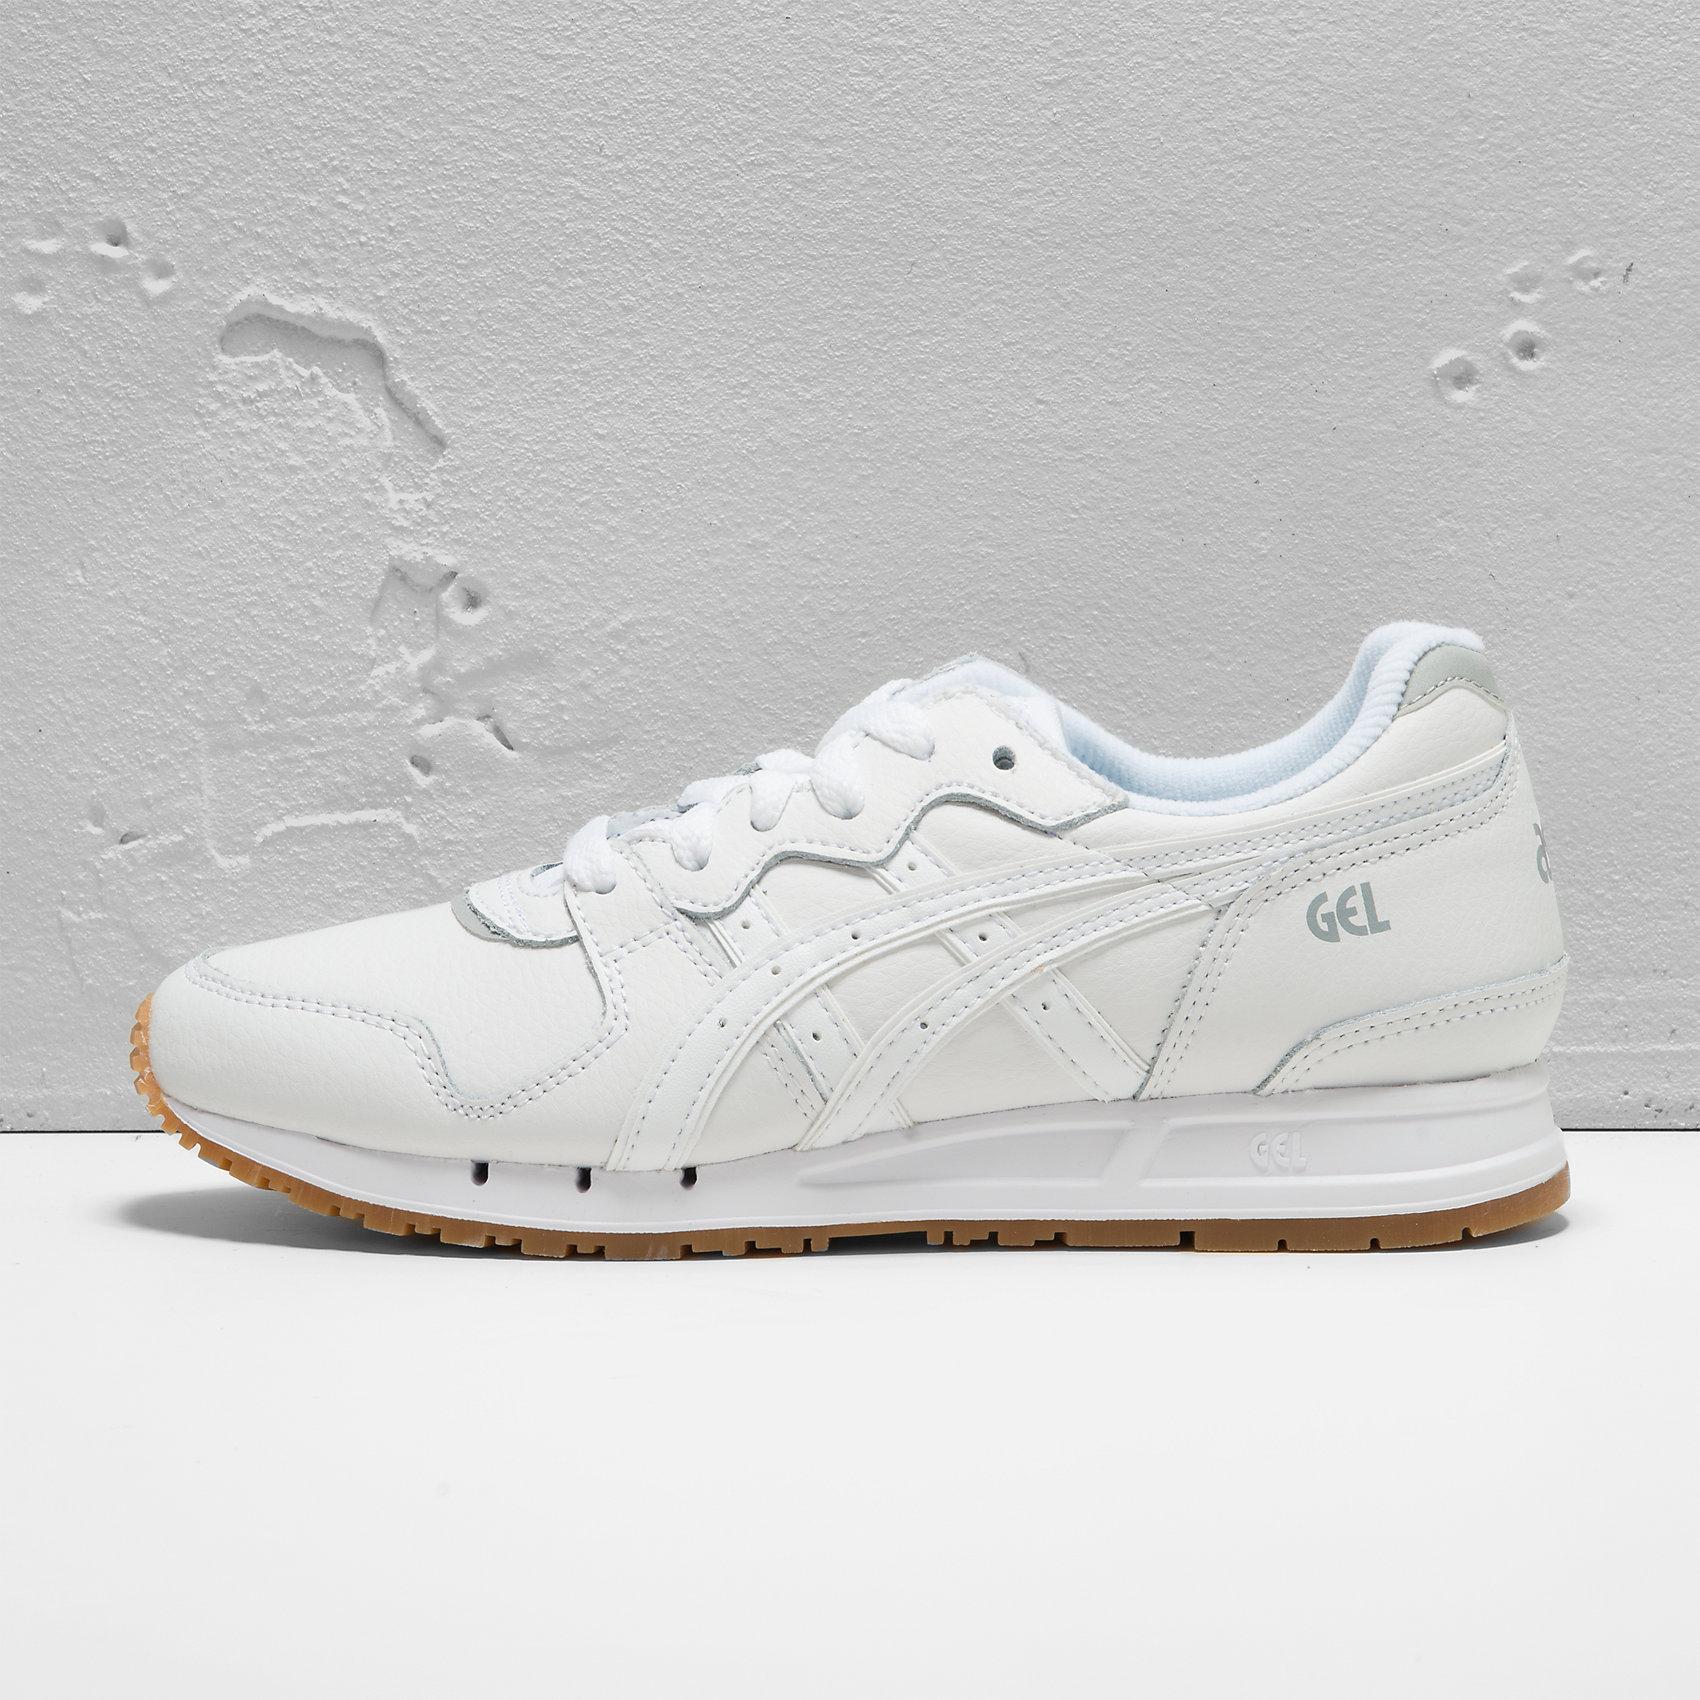 Neu ASICS Tiger GEL MOVIMENTUM Sneakers Low 6668520 f r Damen